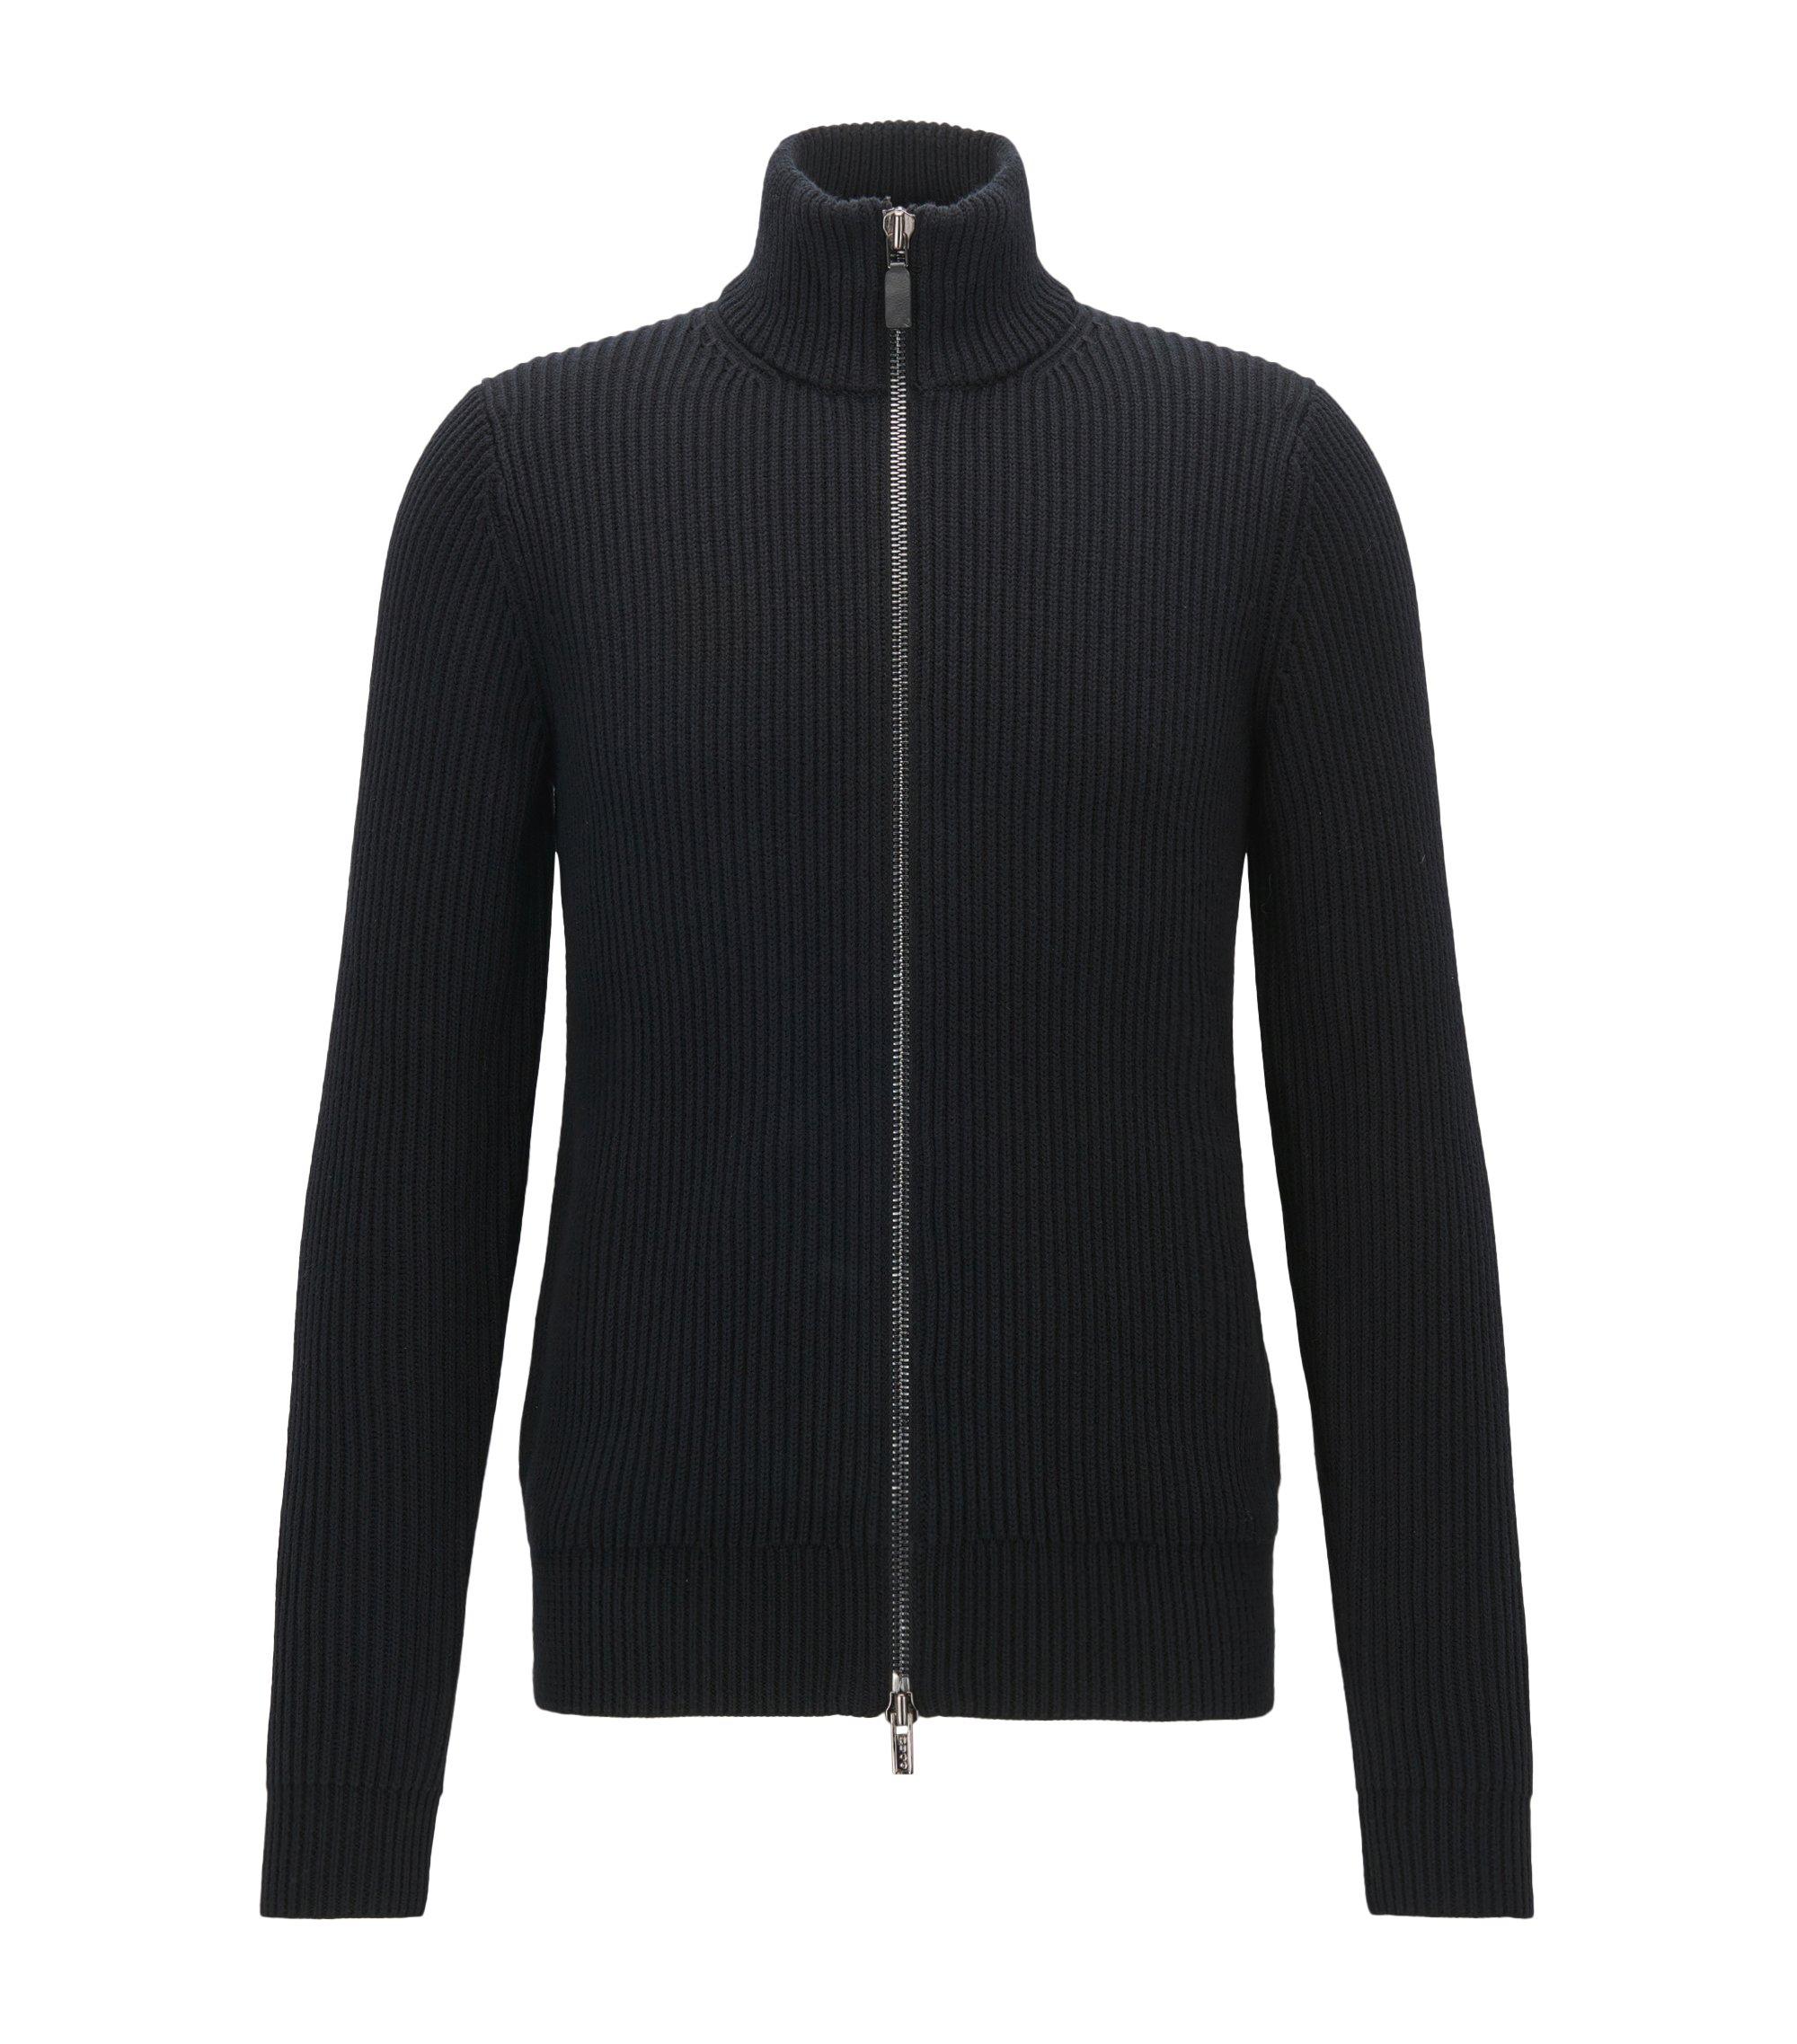 Zip-through cardigan-rib jacket in cotton and wool, Black